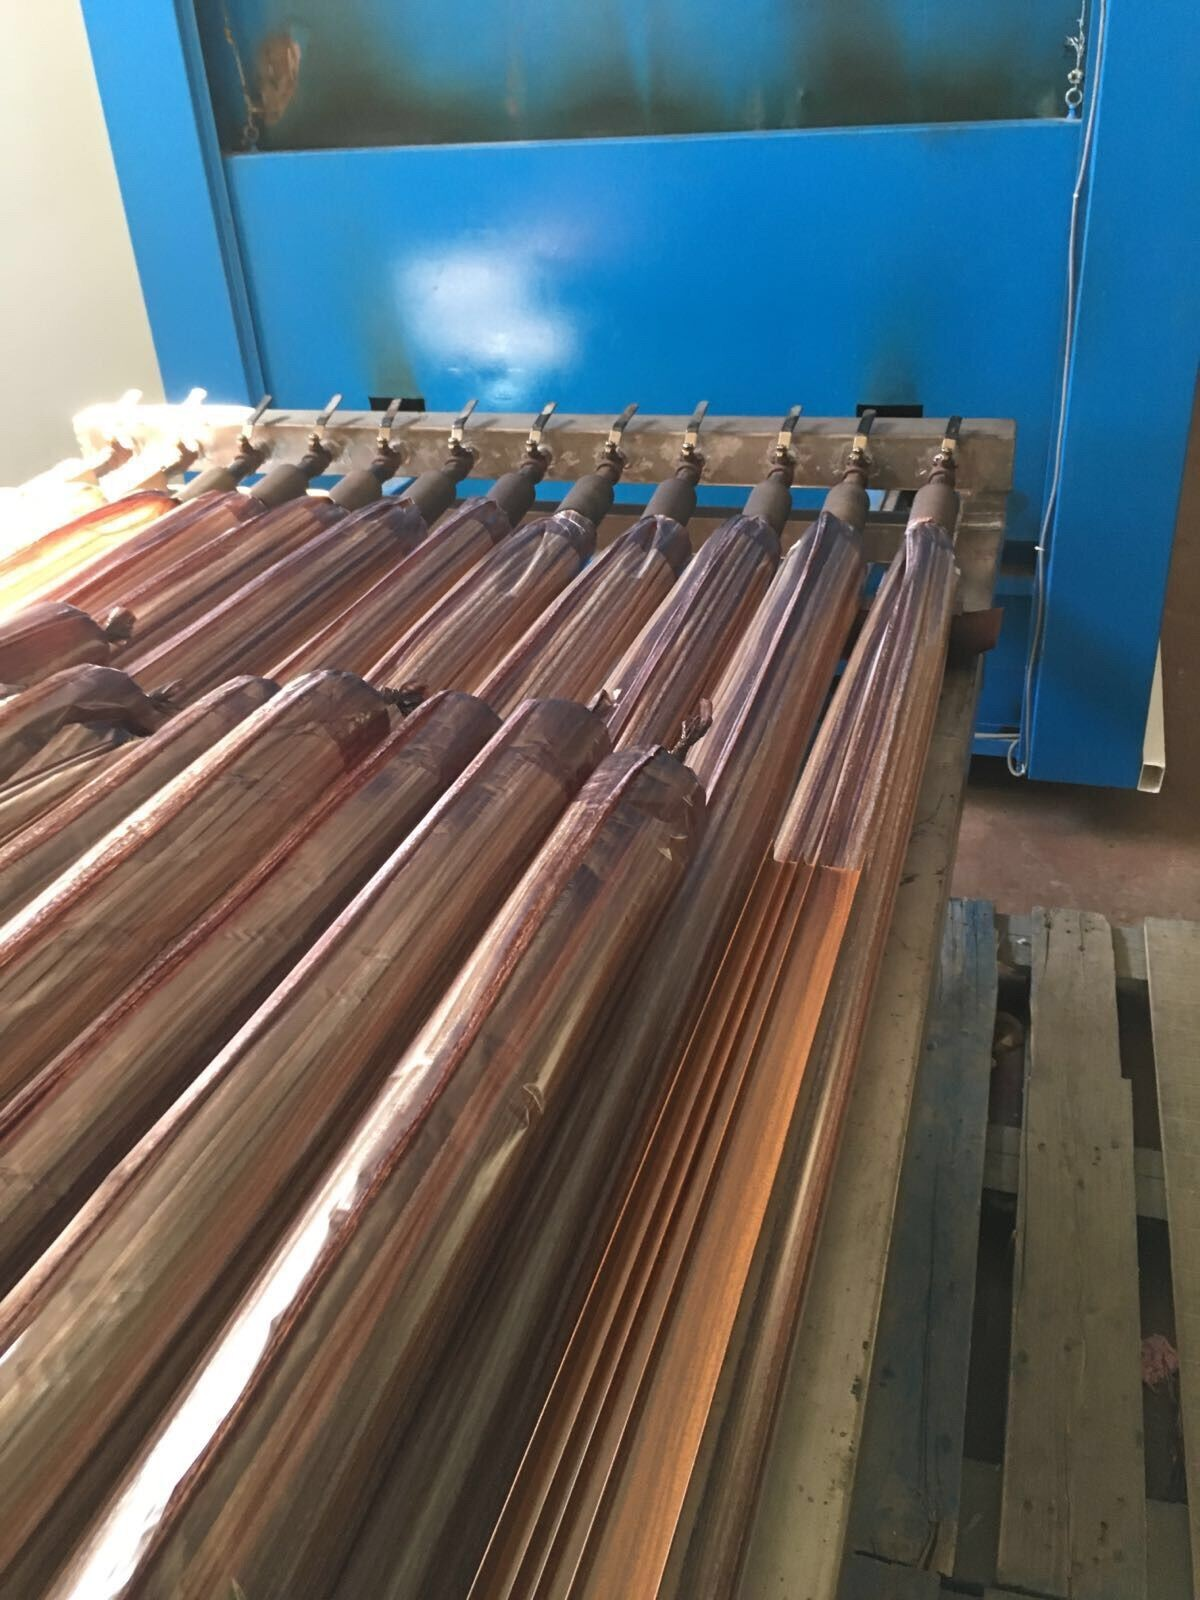 Wood Grain Heat Transfer Machine for Aluminium Profile Manufacturers, Wood Grain Heat Transfer Machine for Aluminium Profile Factory, Supply Wood Grain Heat Transfer Machine for Aluminium Profile